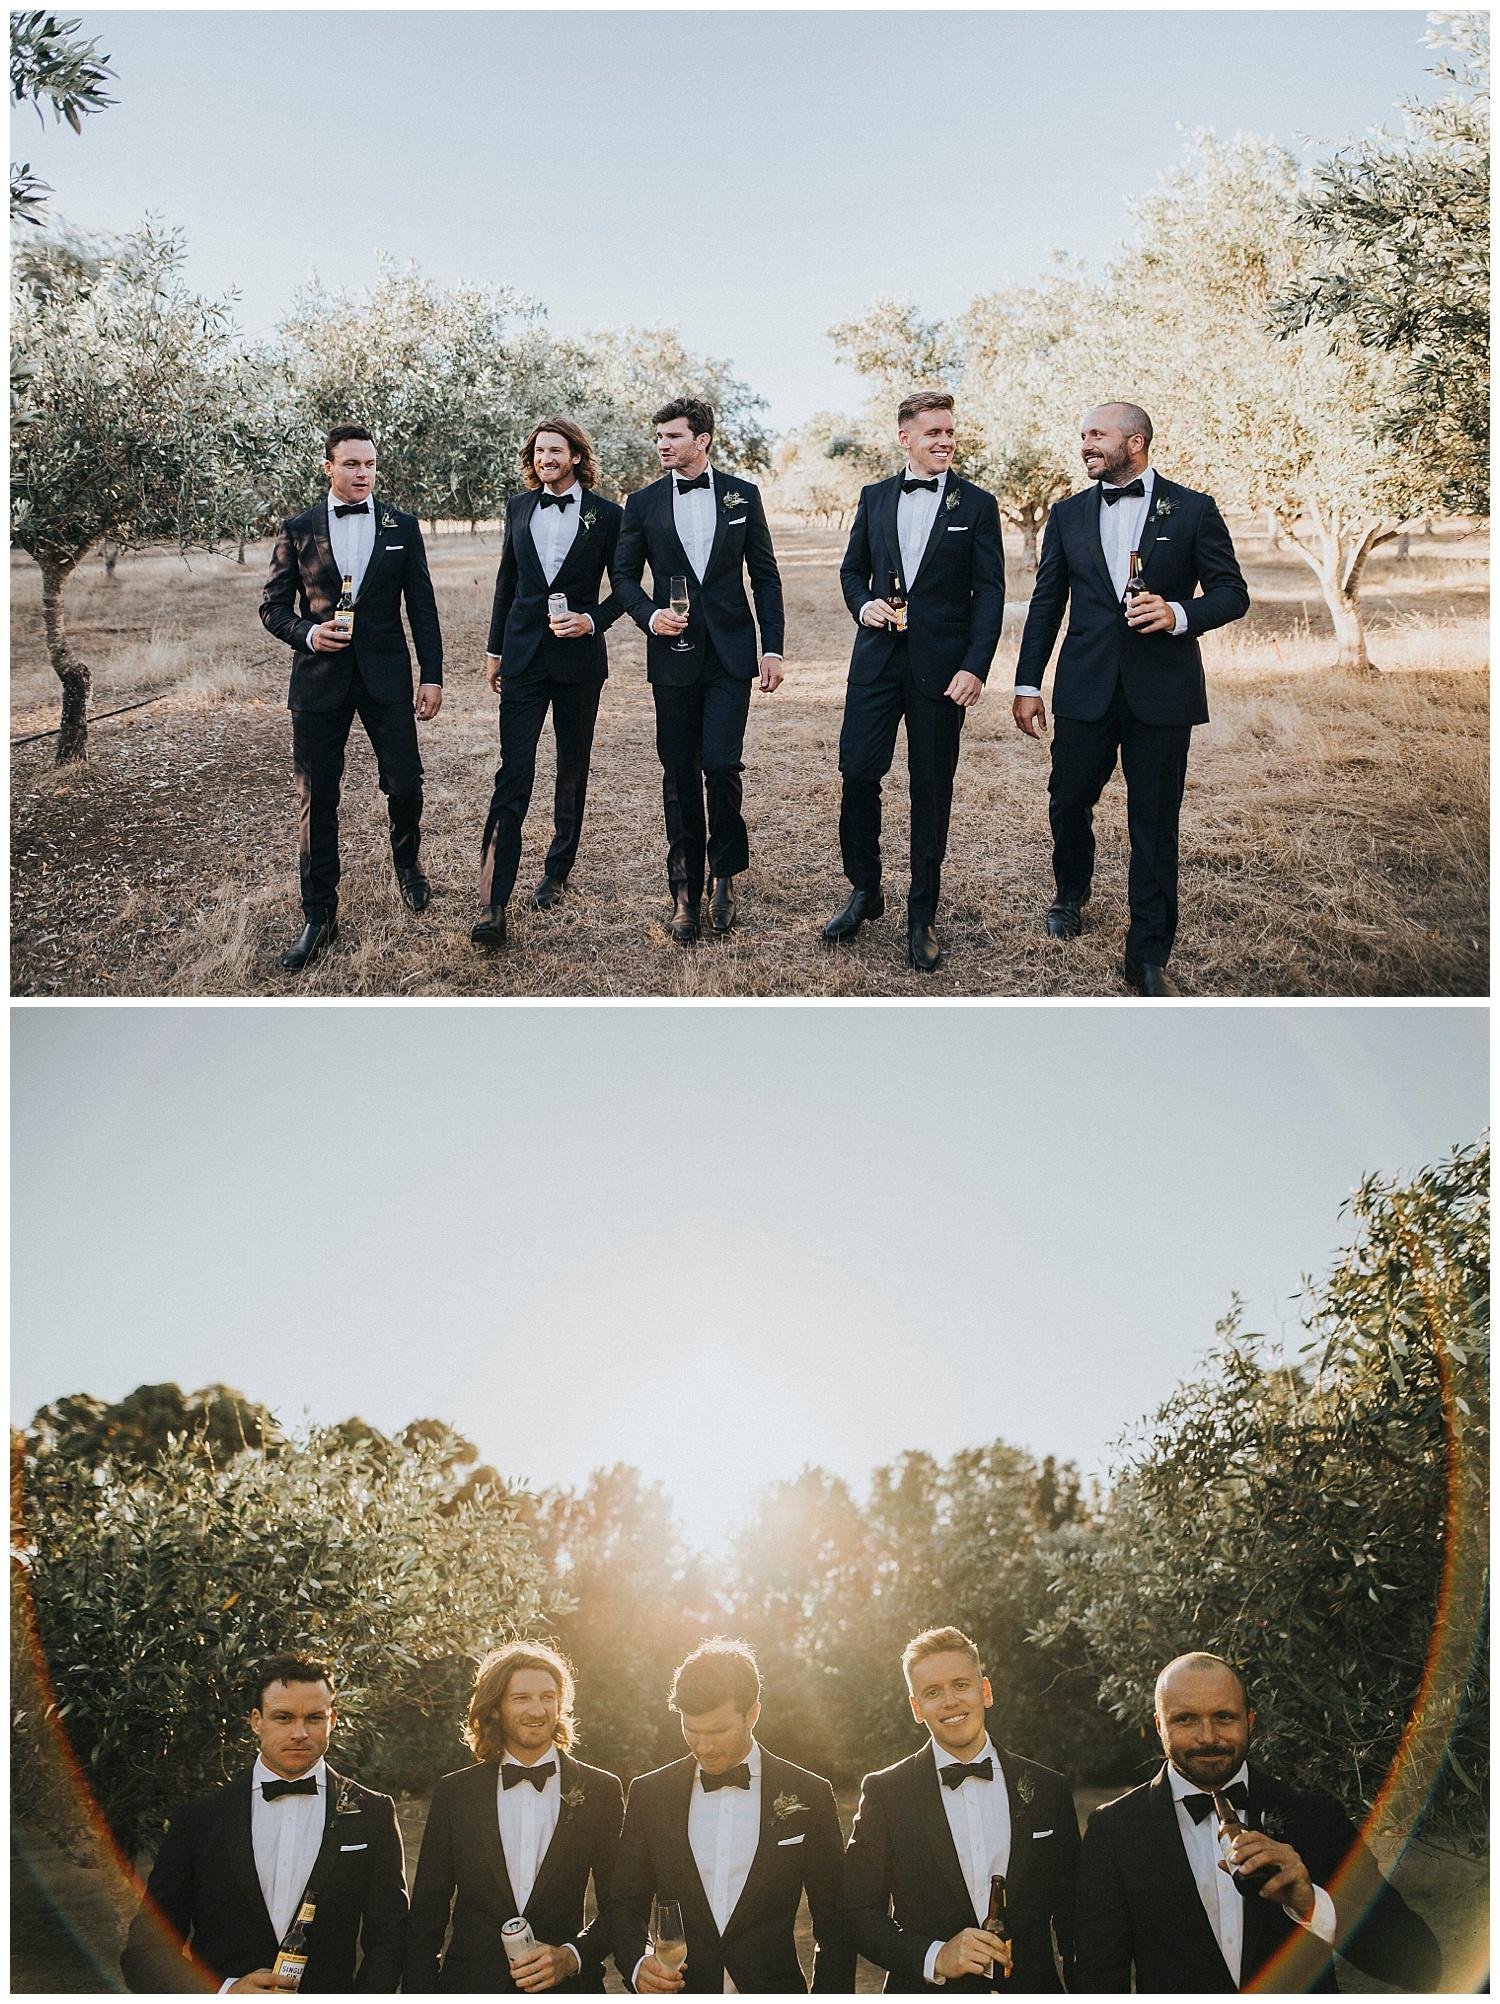 olio_bello_wedding_keeper_creative_025.JPG